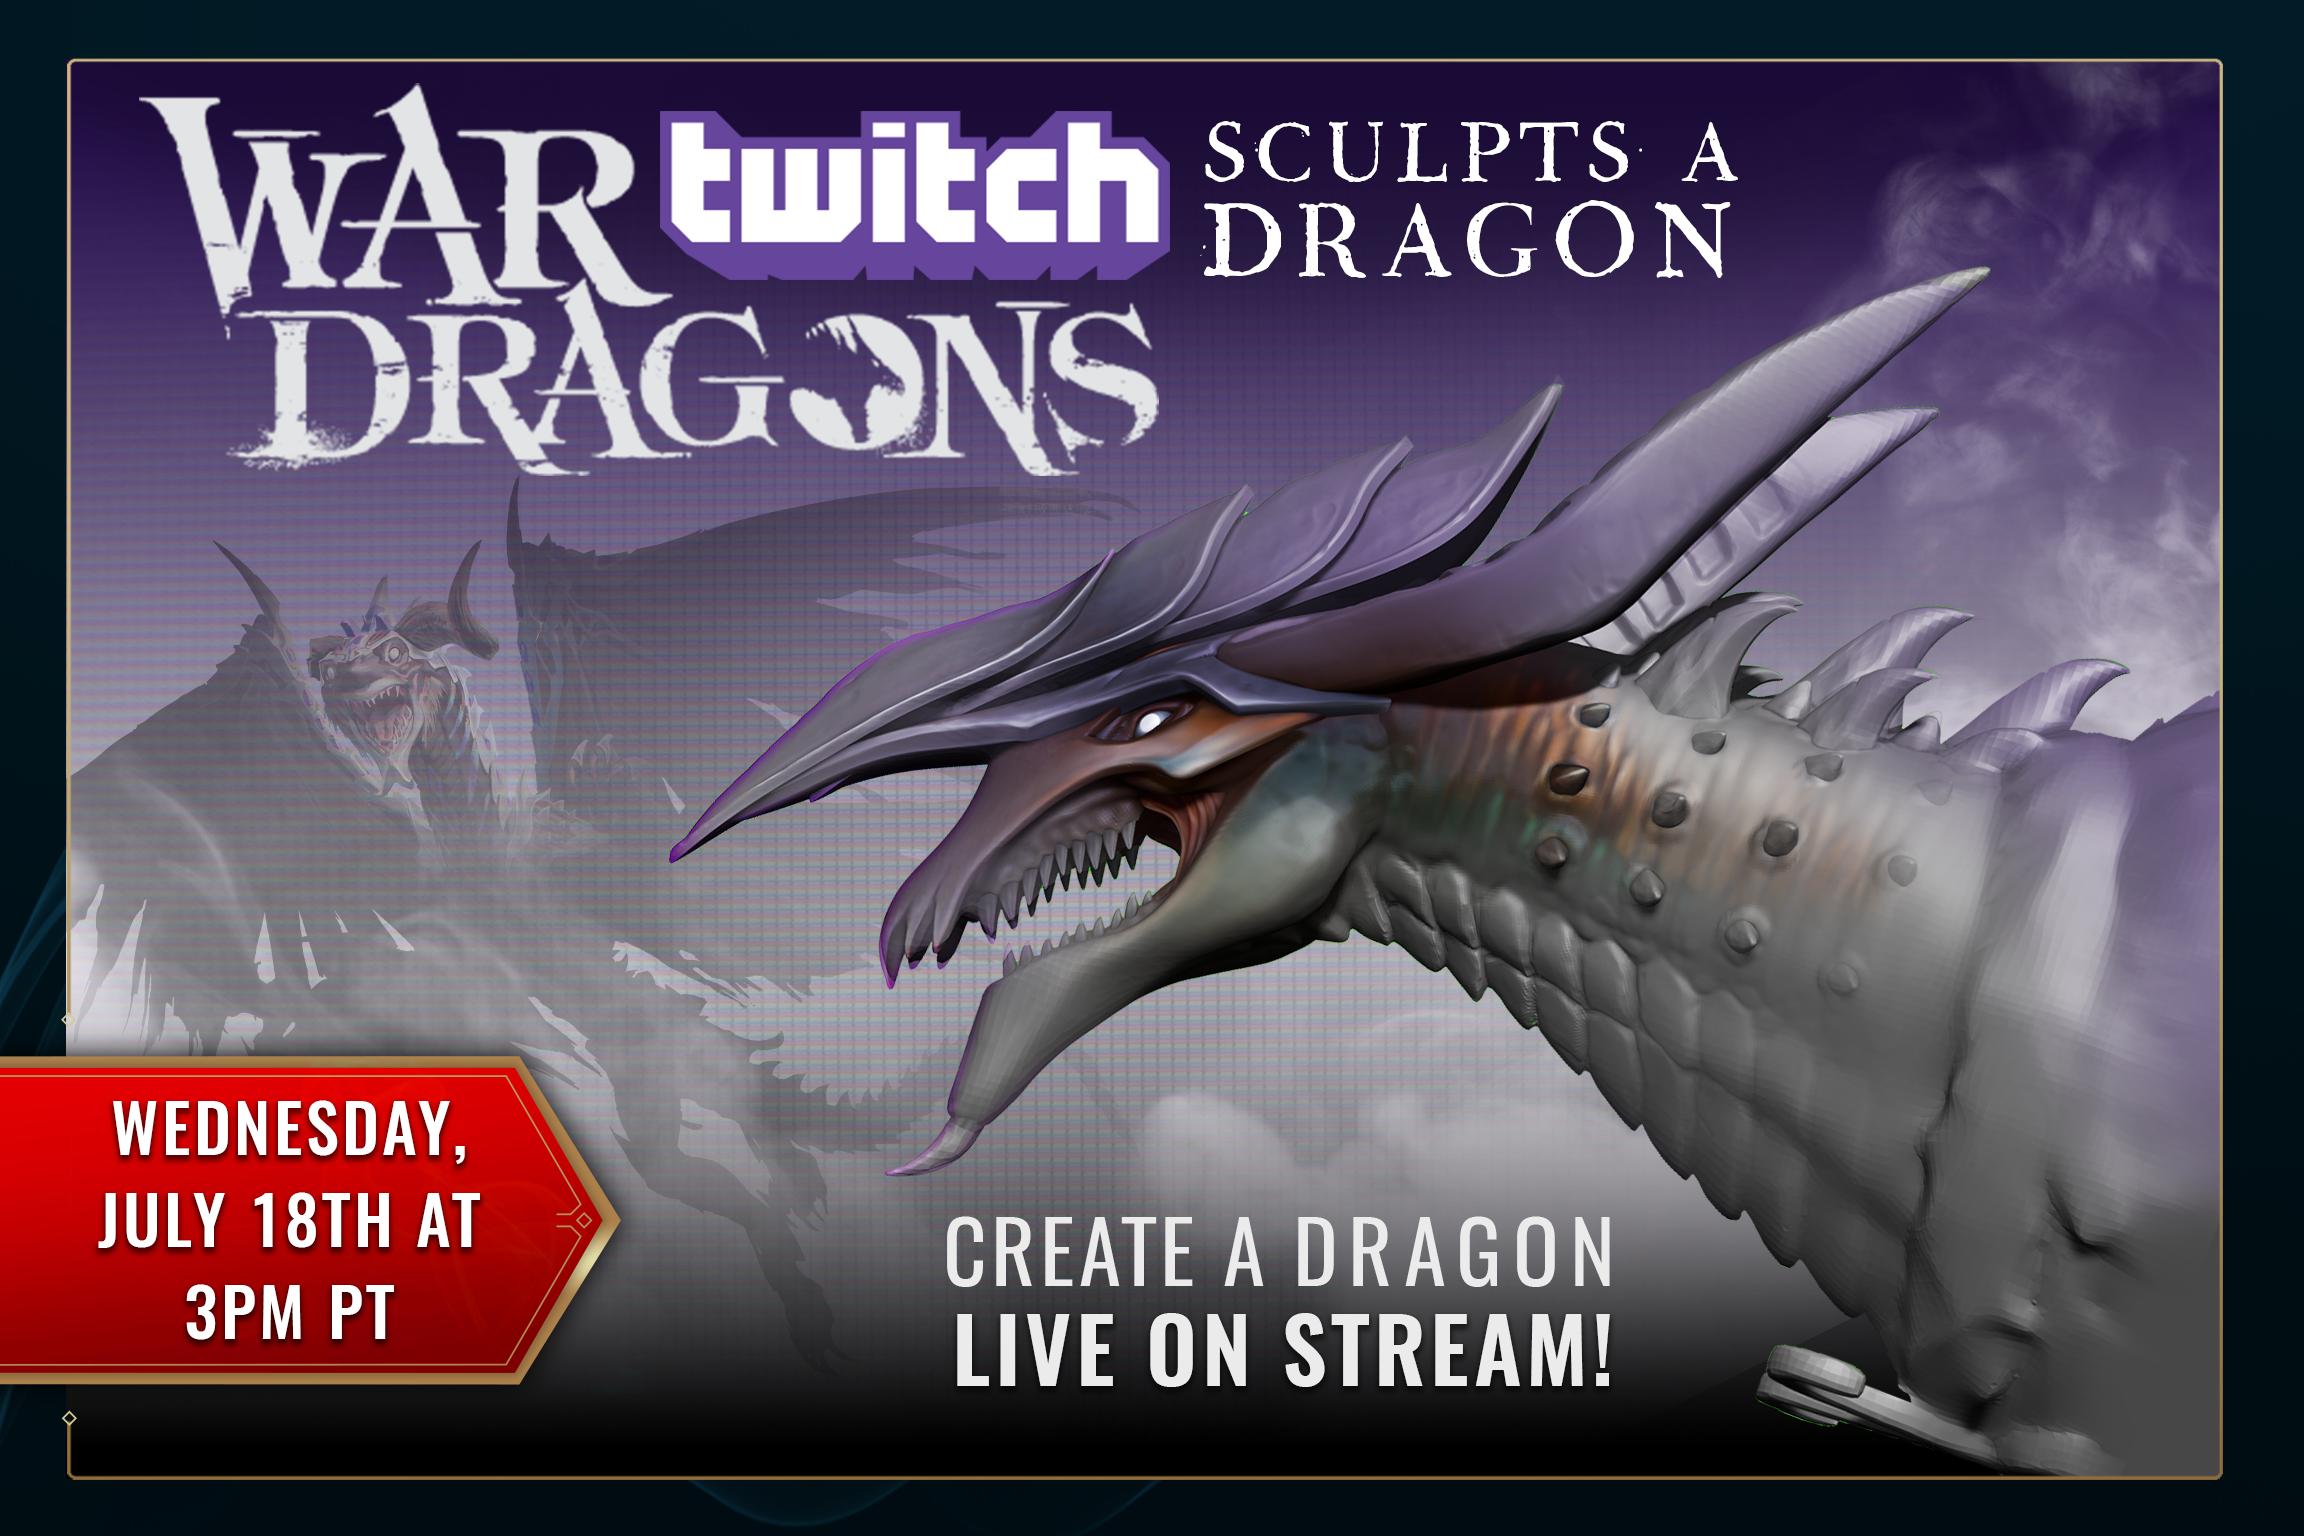 Twitch Sculpts A Dragon 2018